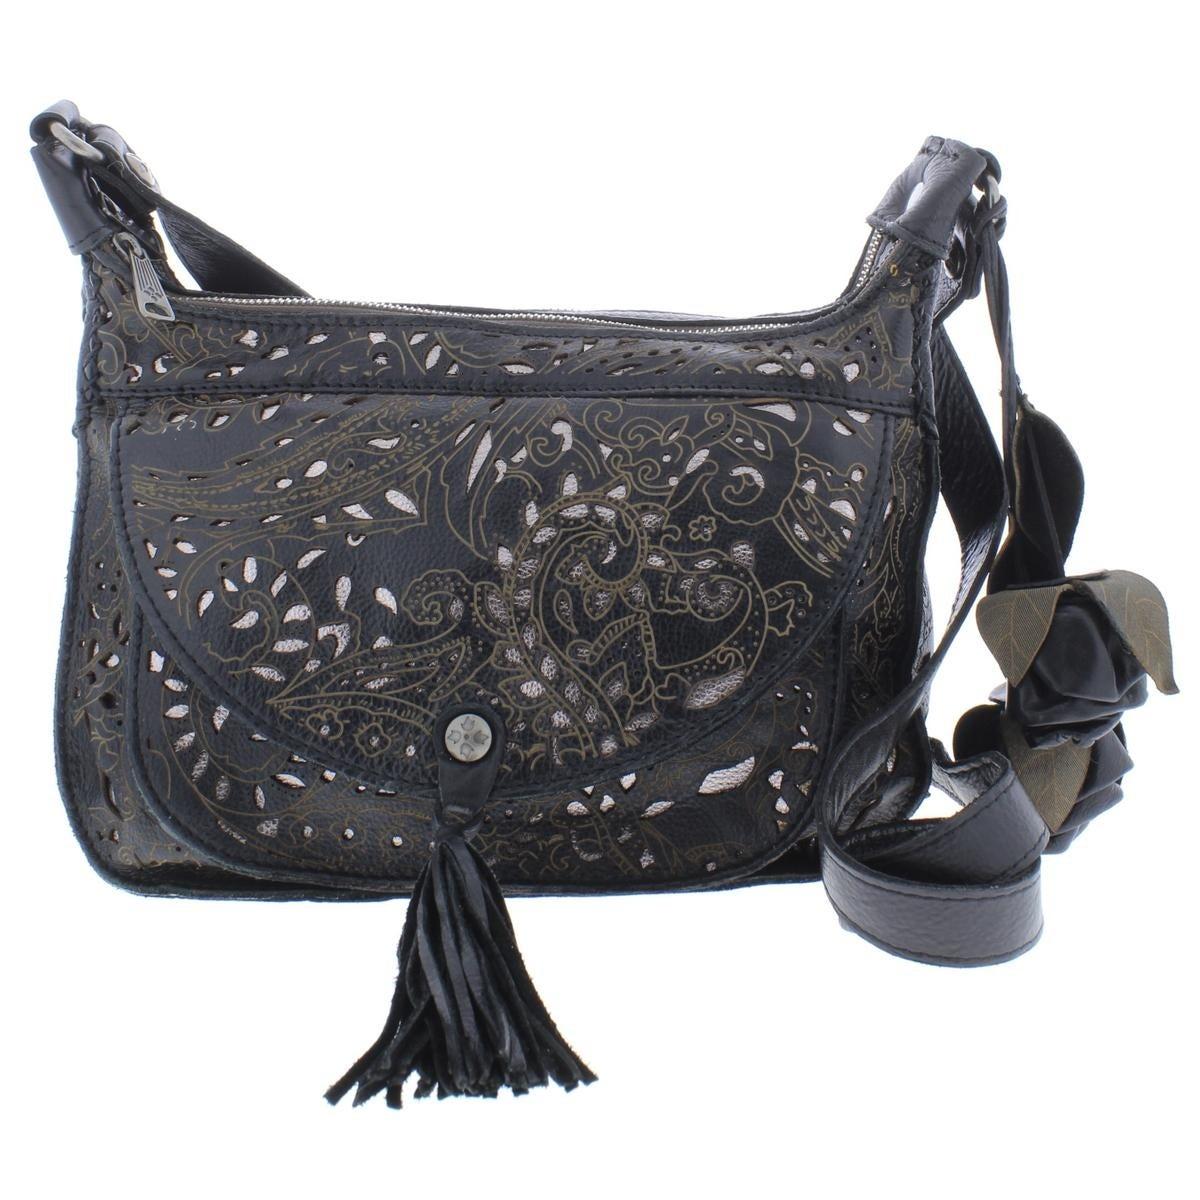 160944bb6c5f Patricia Nash Womens Camila Crossbody Handbag Leather Laser Lace - LARGE